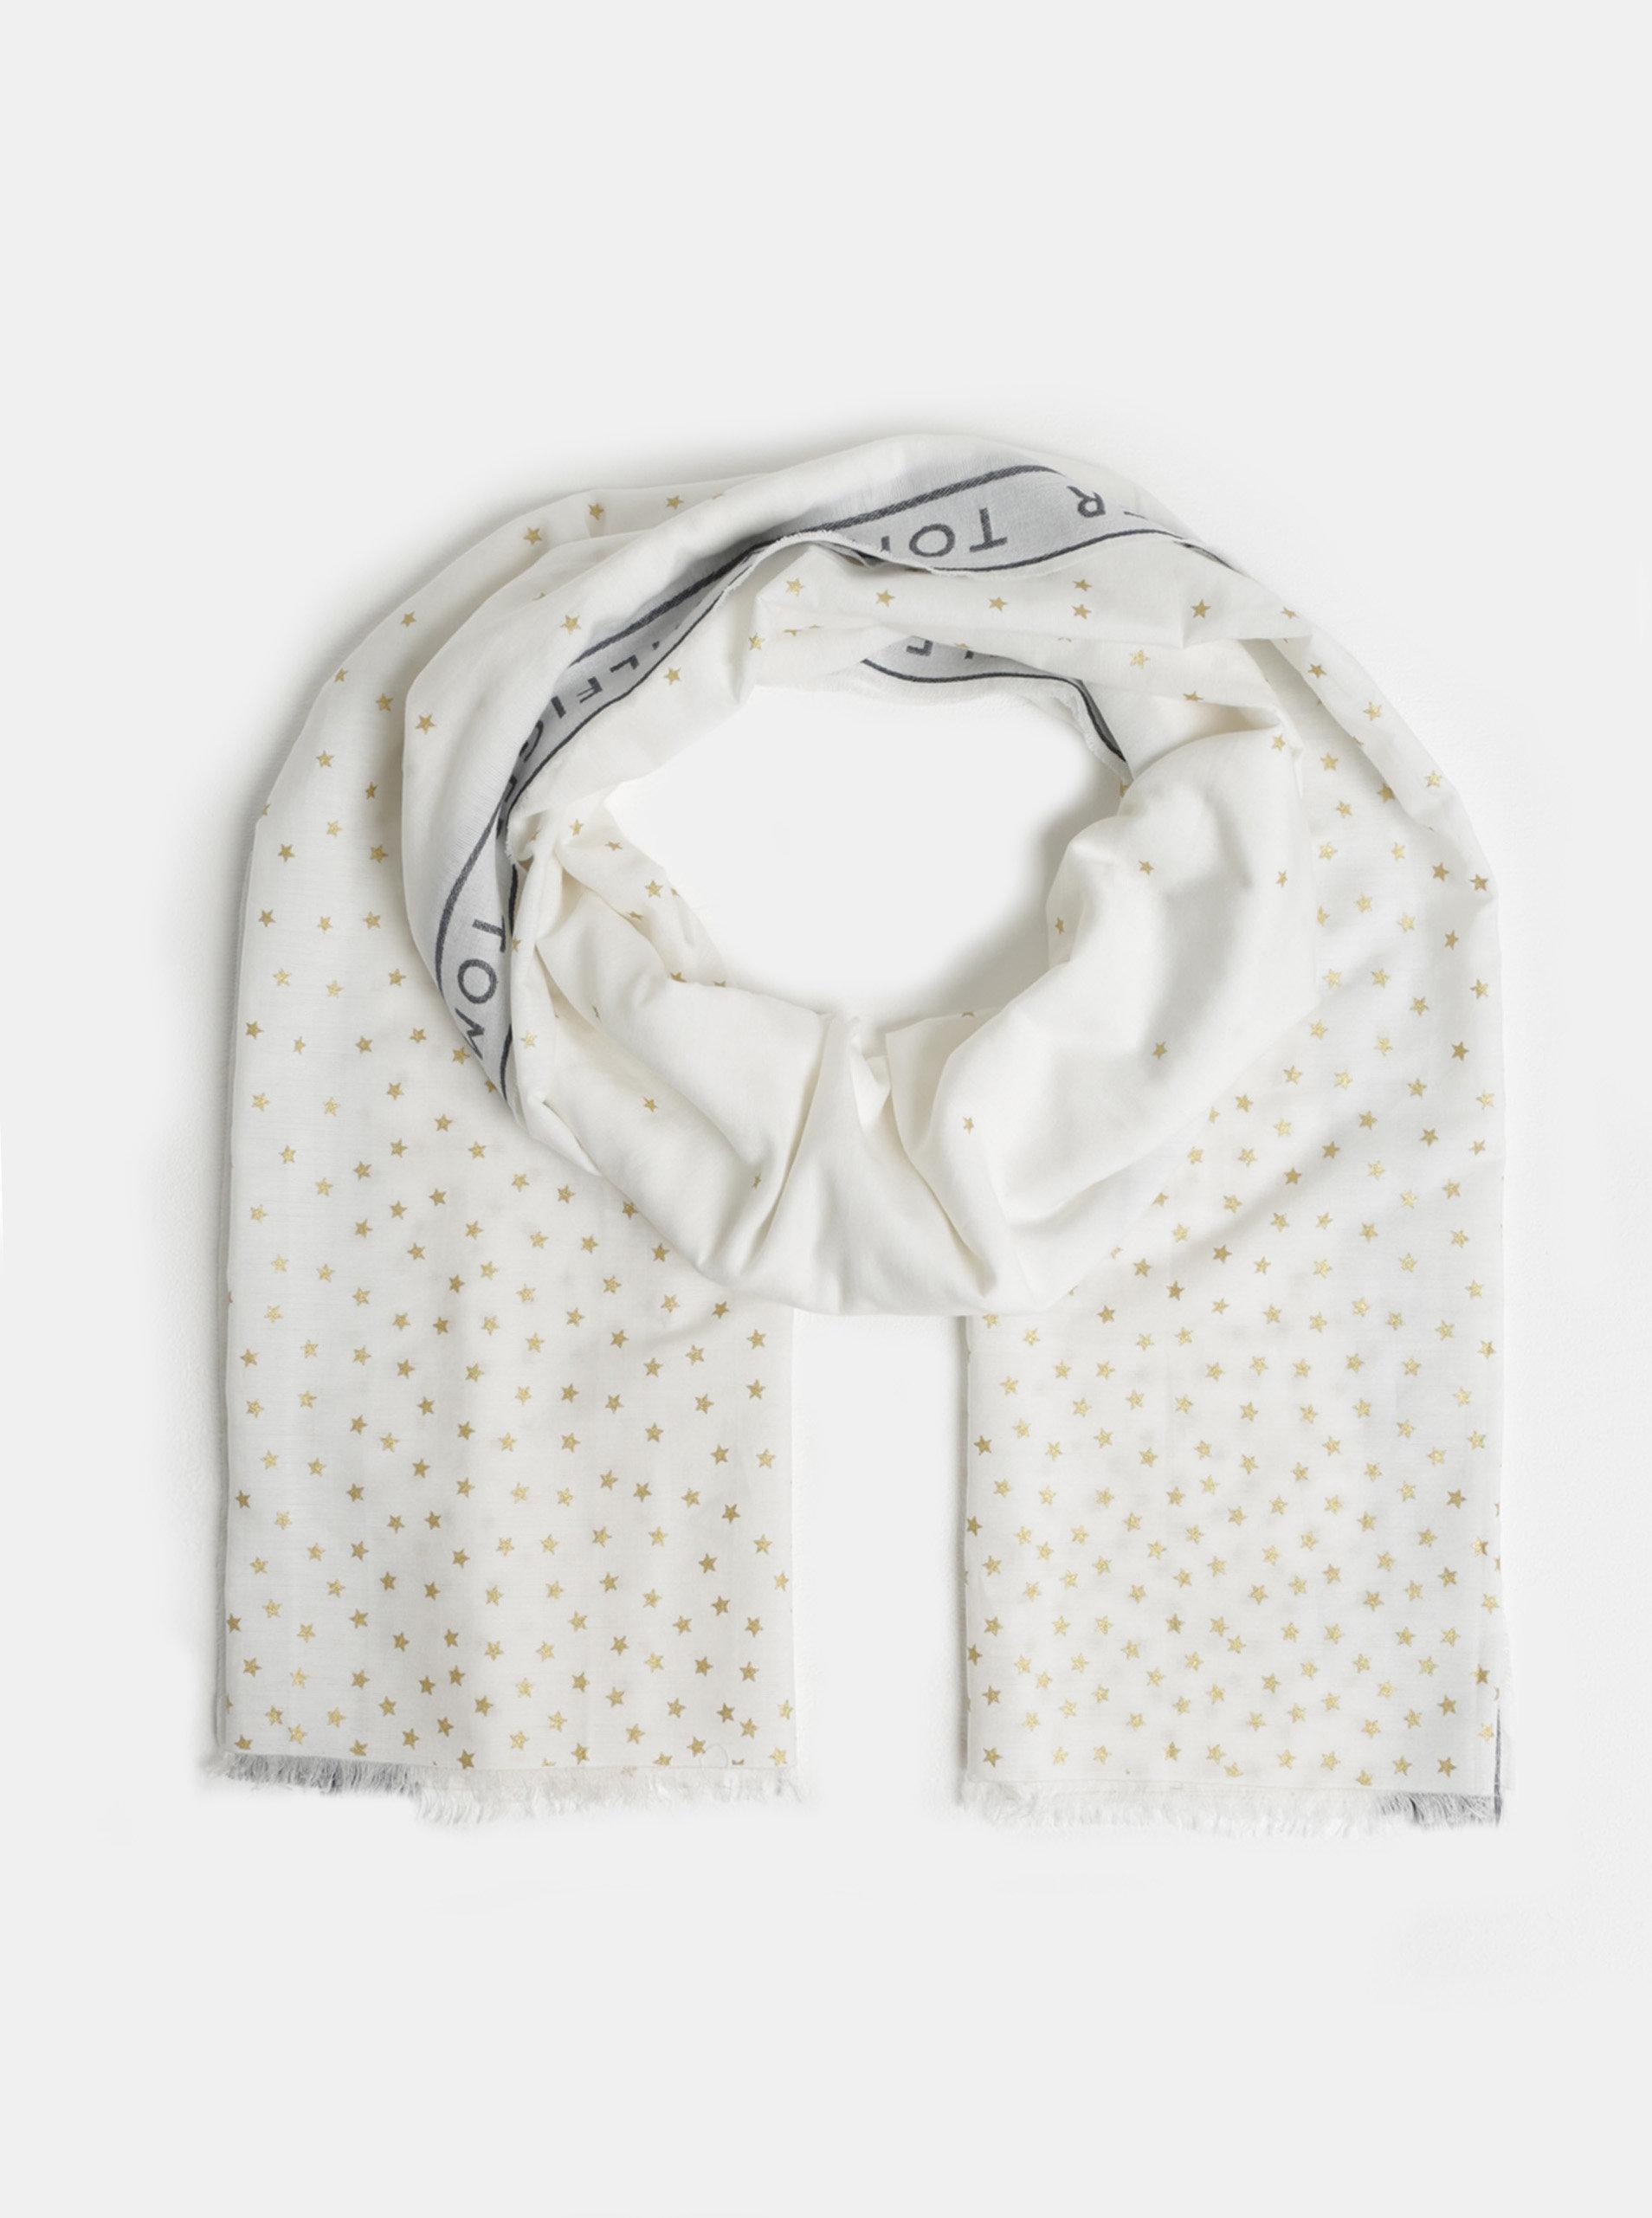 Bílý dámský vzorovaný šátek Tommy Hilfiger